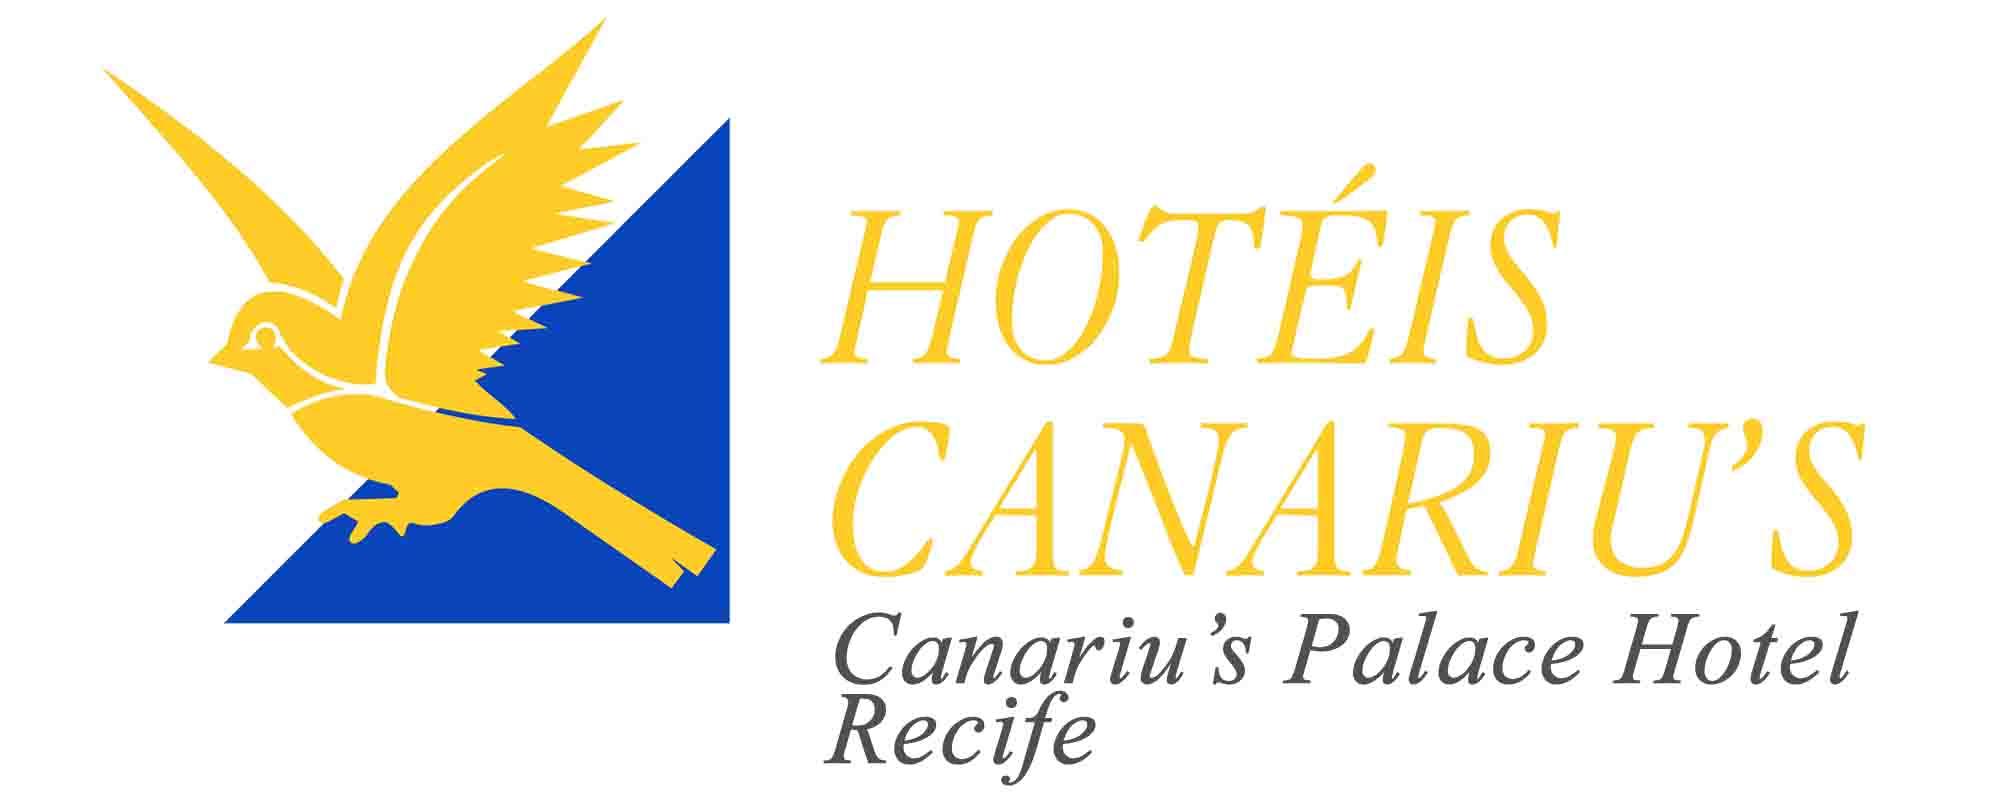 CANARIU'S PALACE HOTEL RECIFE